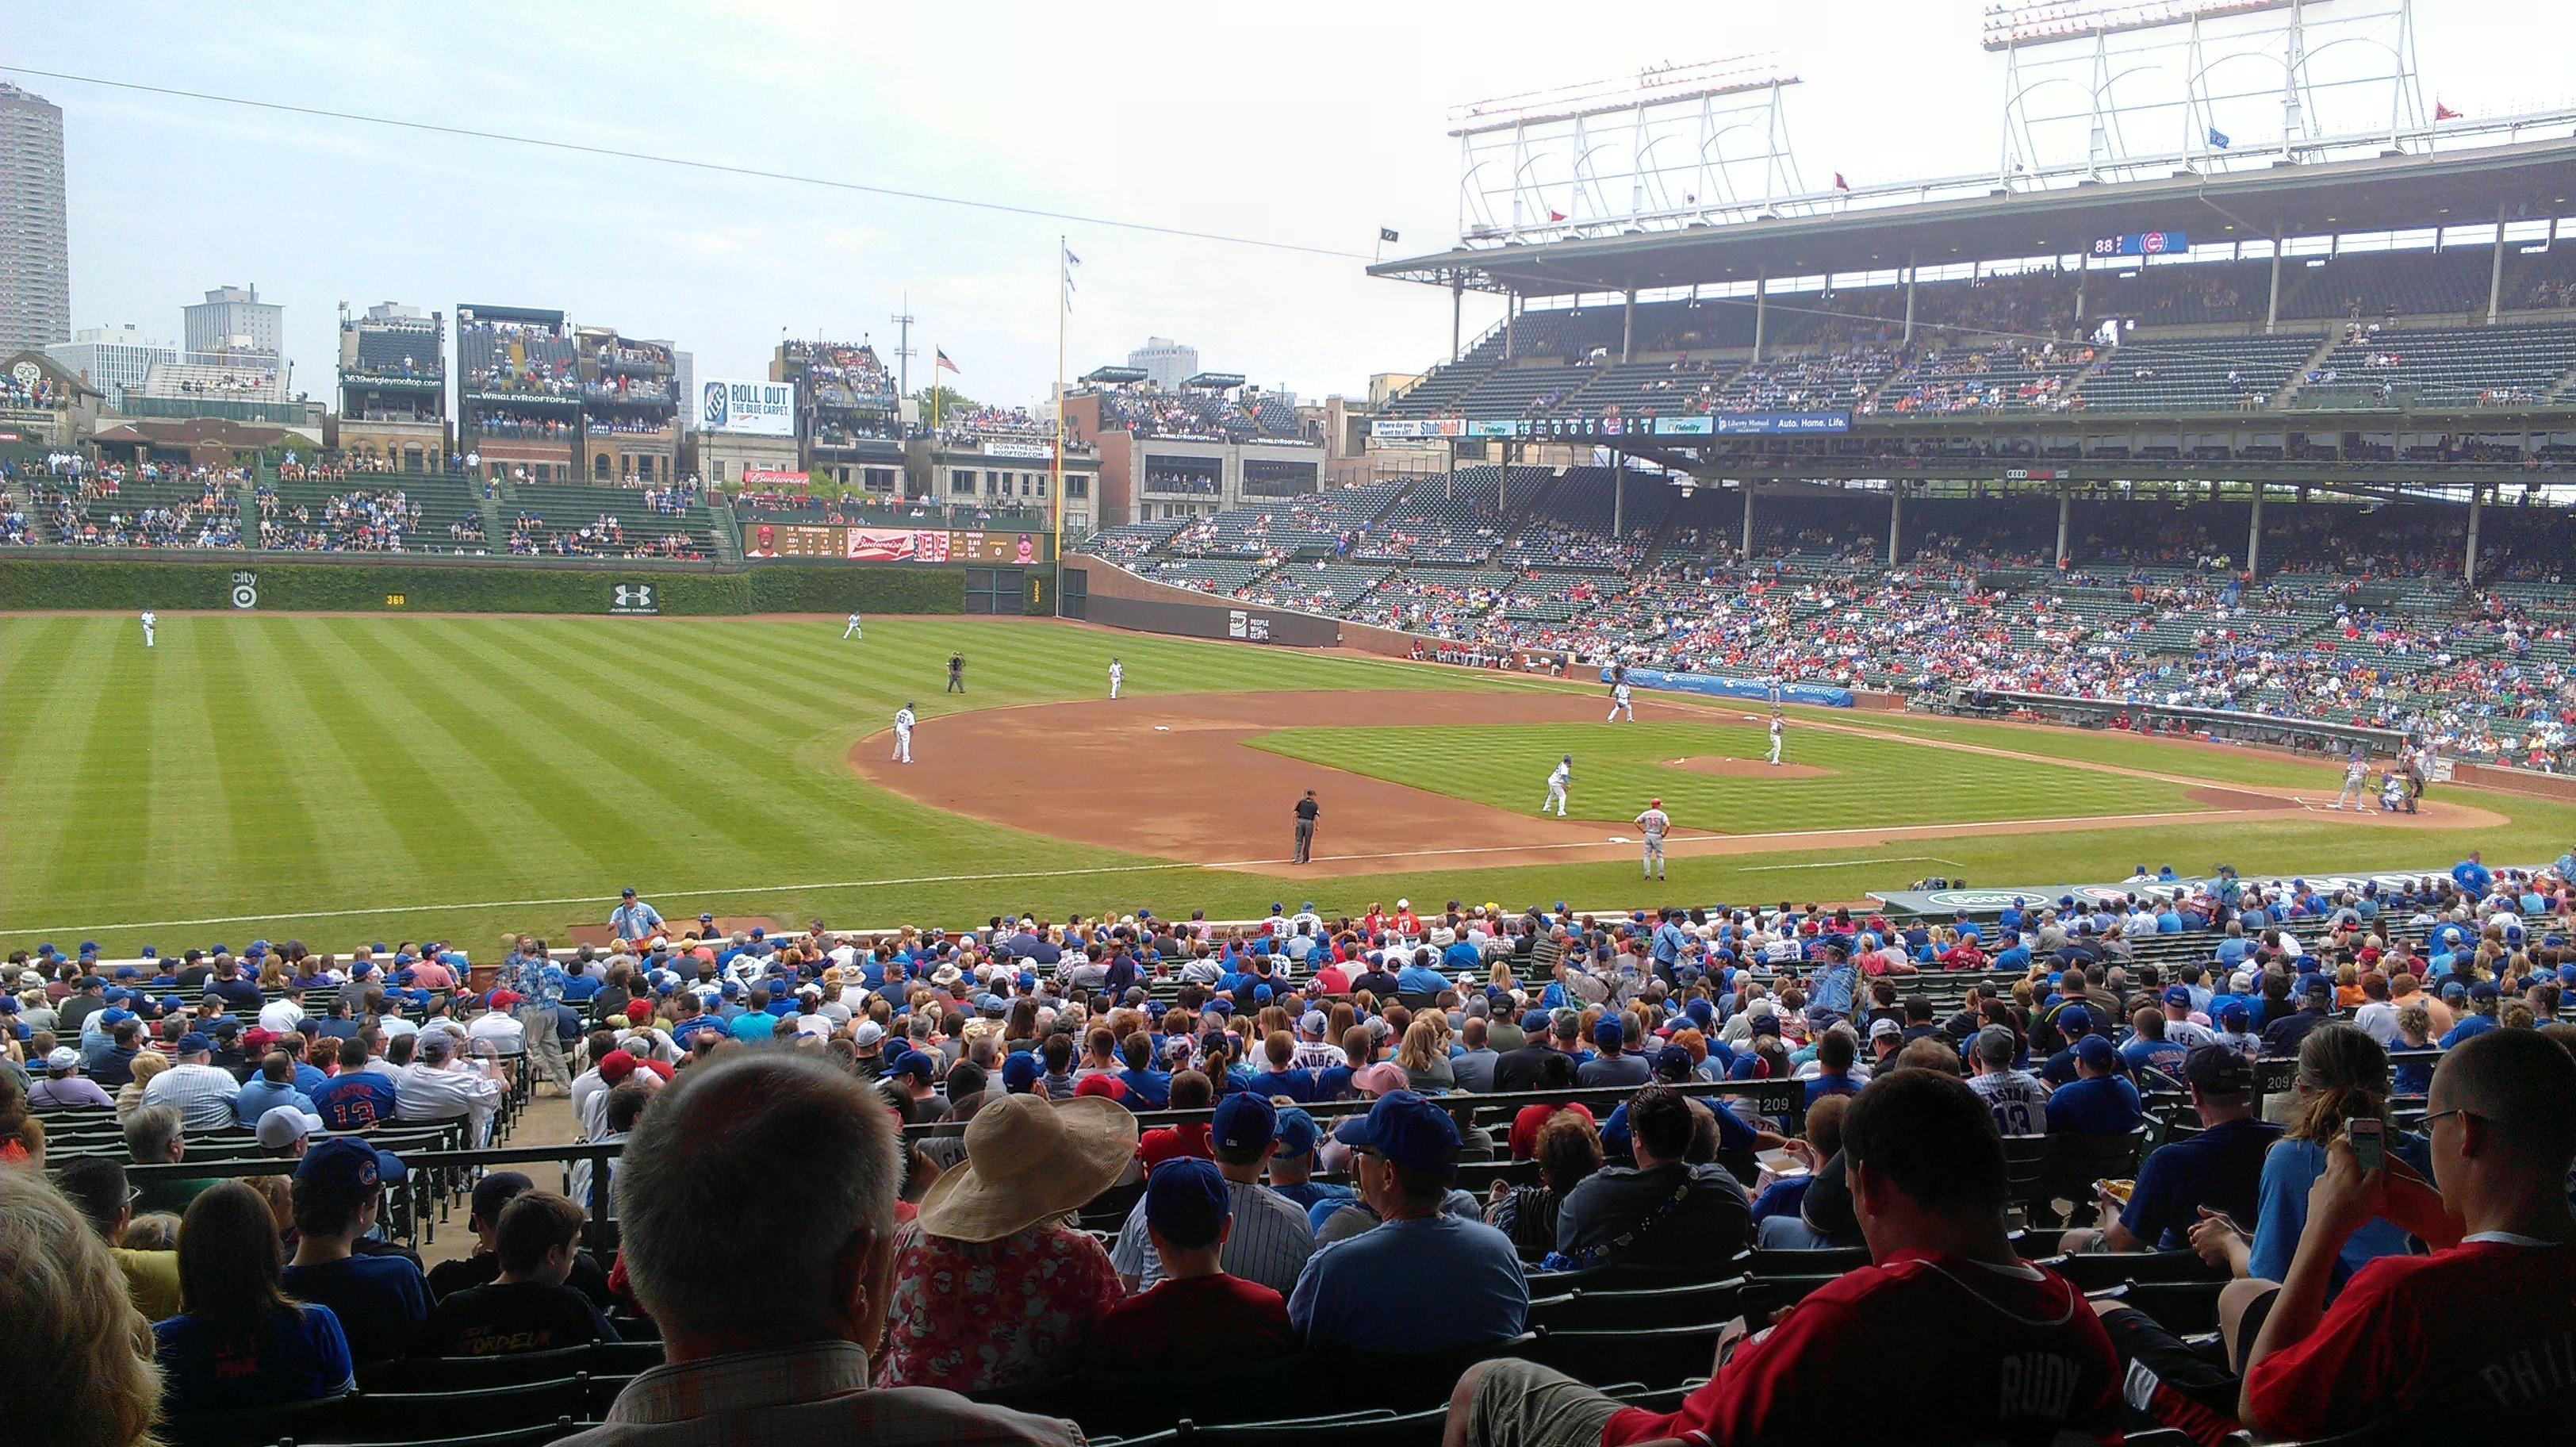 Wrigley Field section 208 row 9 seat 12 Chicago Cubs vs Cincinnati